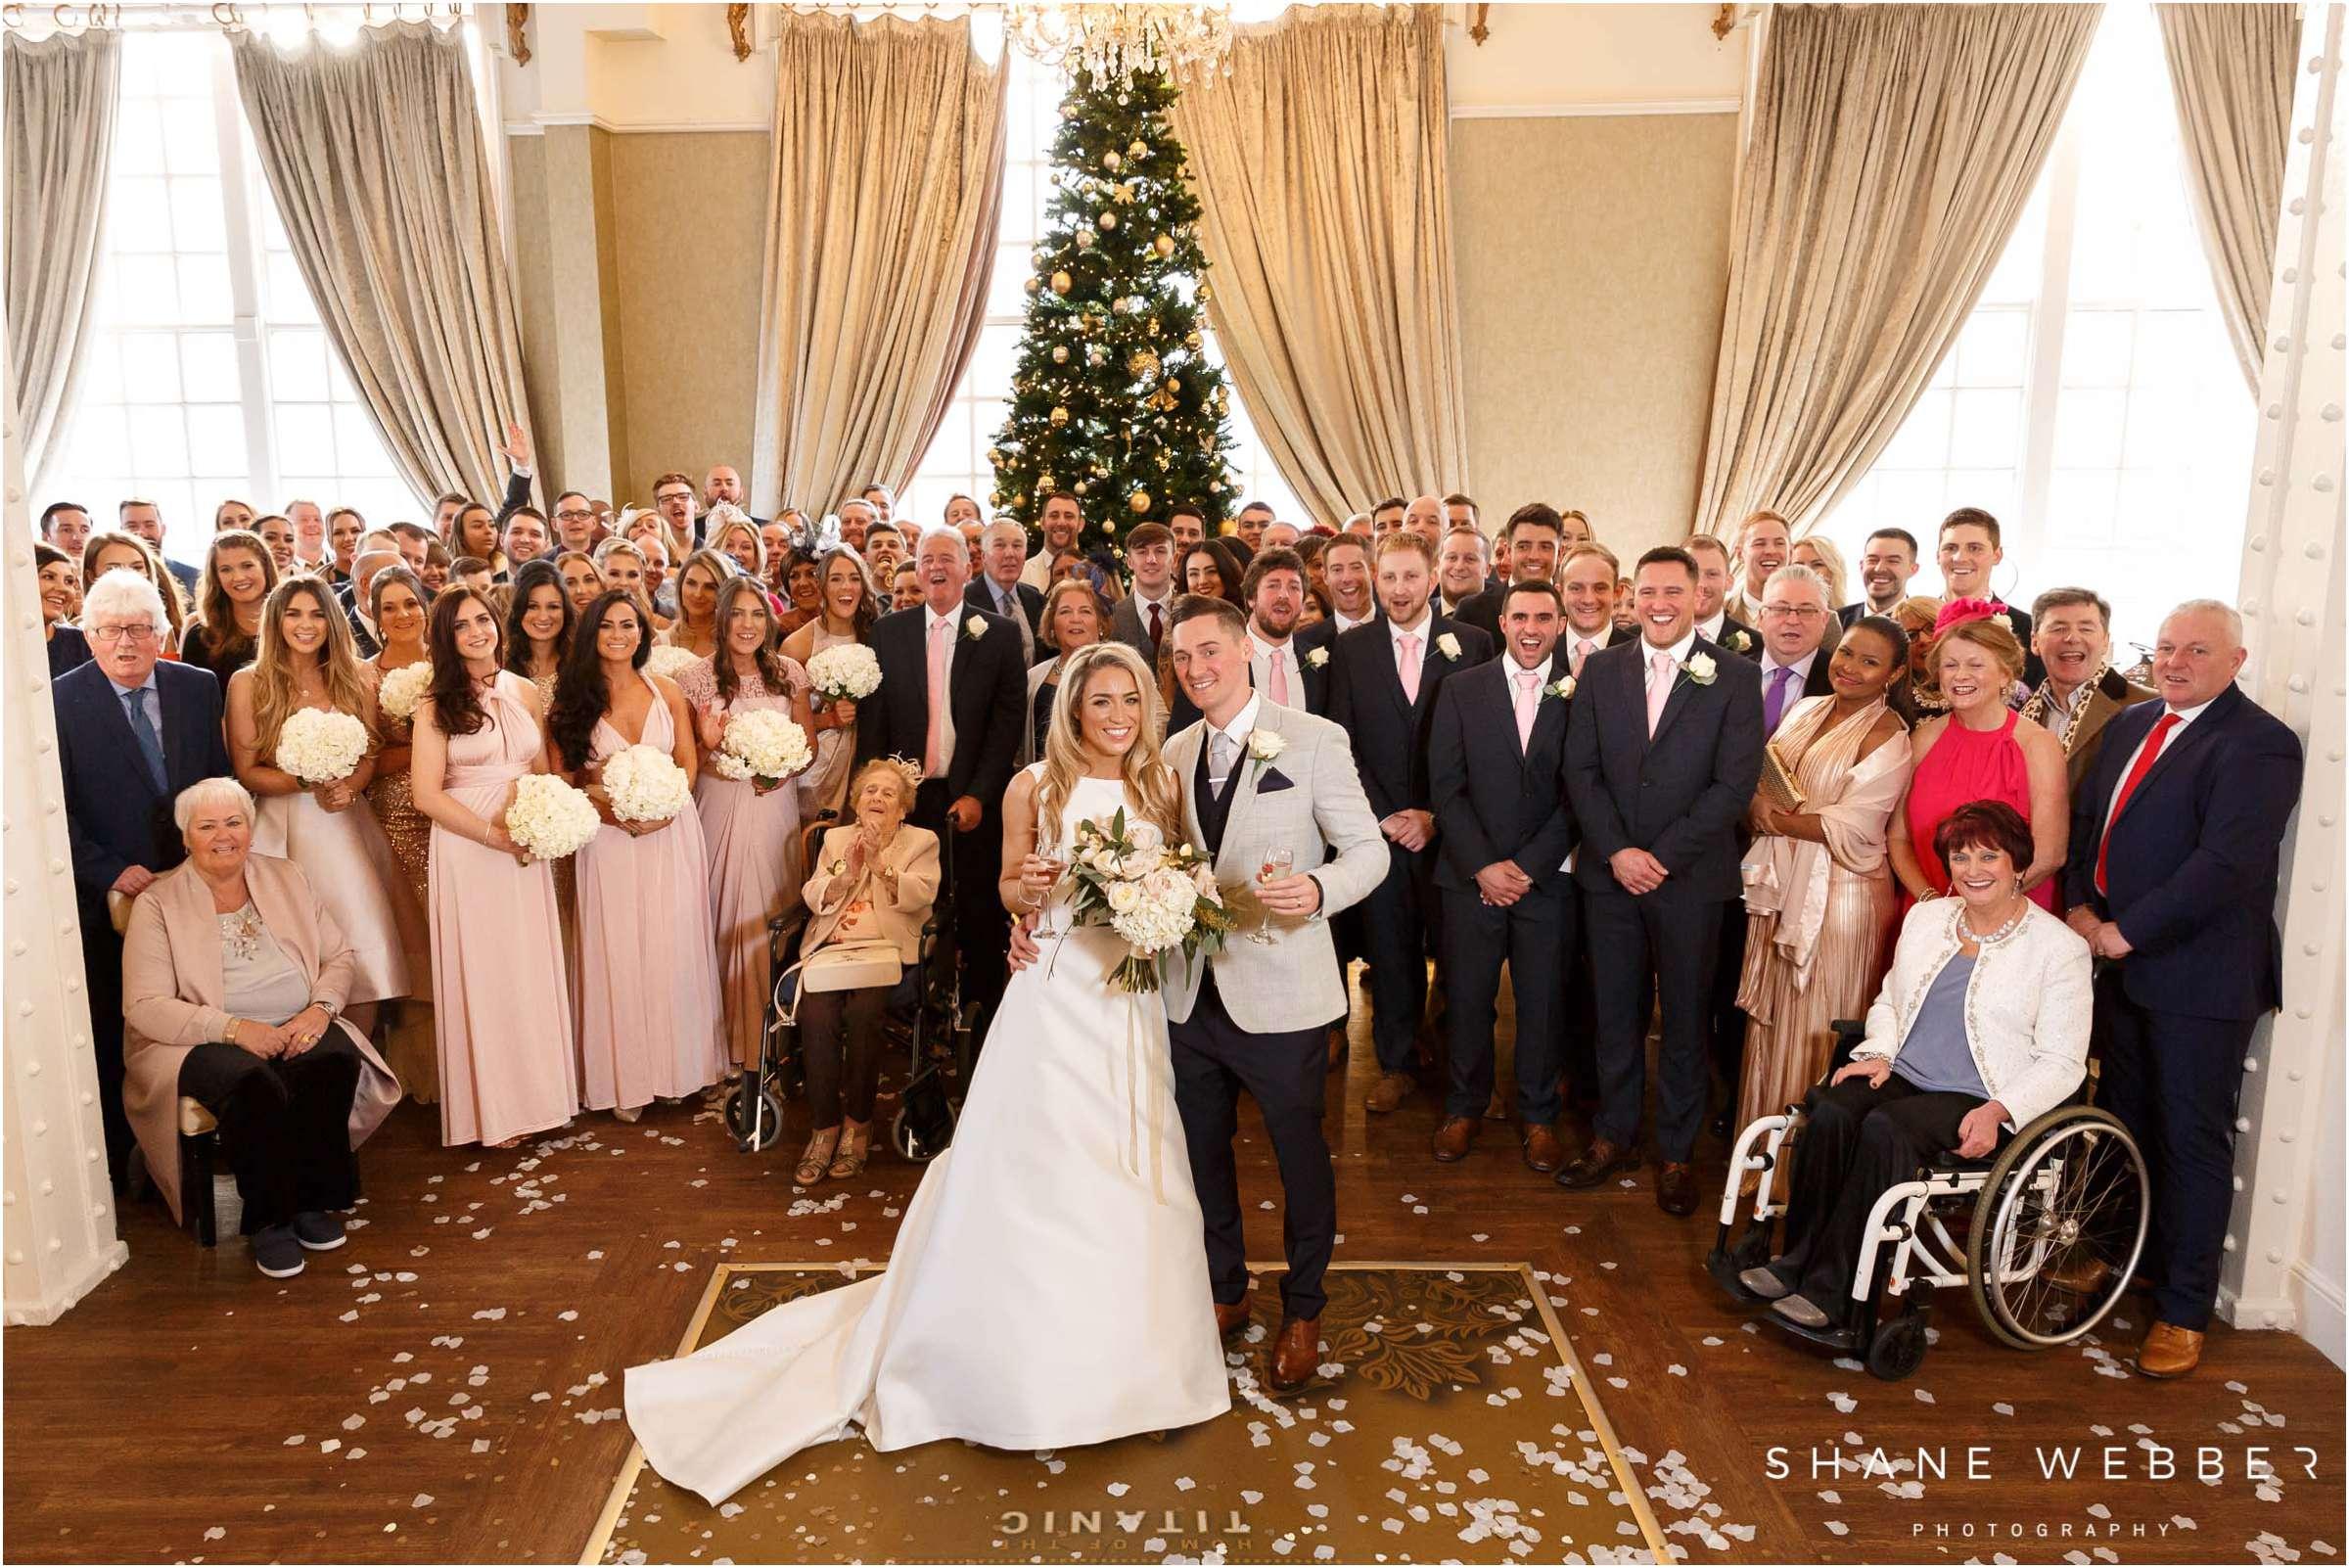 group wedding photo ideas